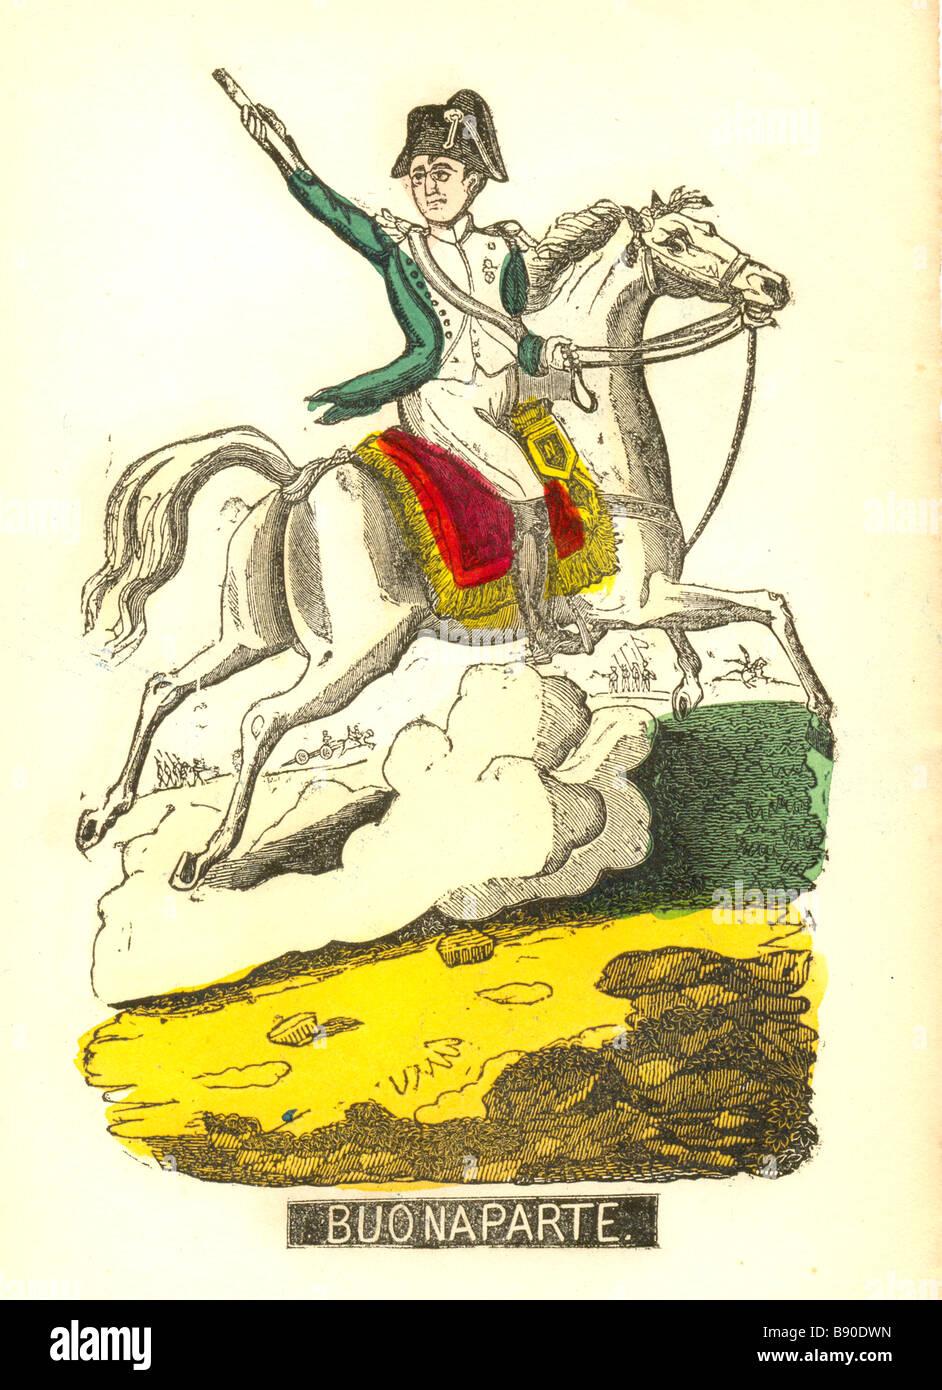 Handcolored xilogravura de Napoleão Buonaparte circa 1820 Imagens de Stock